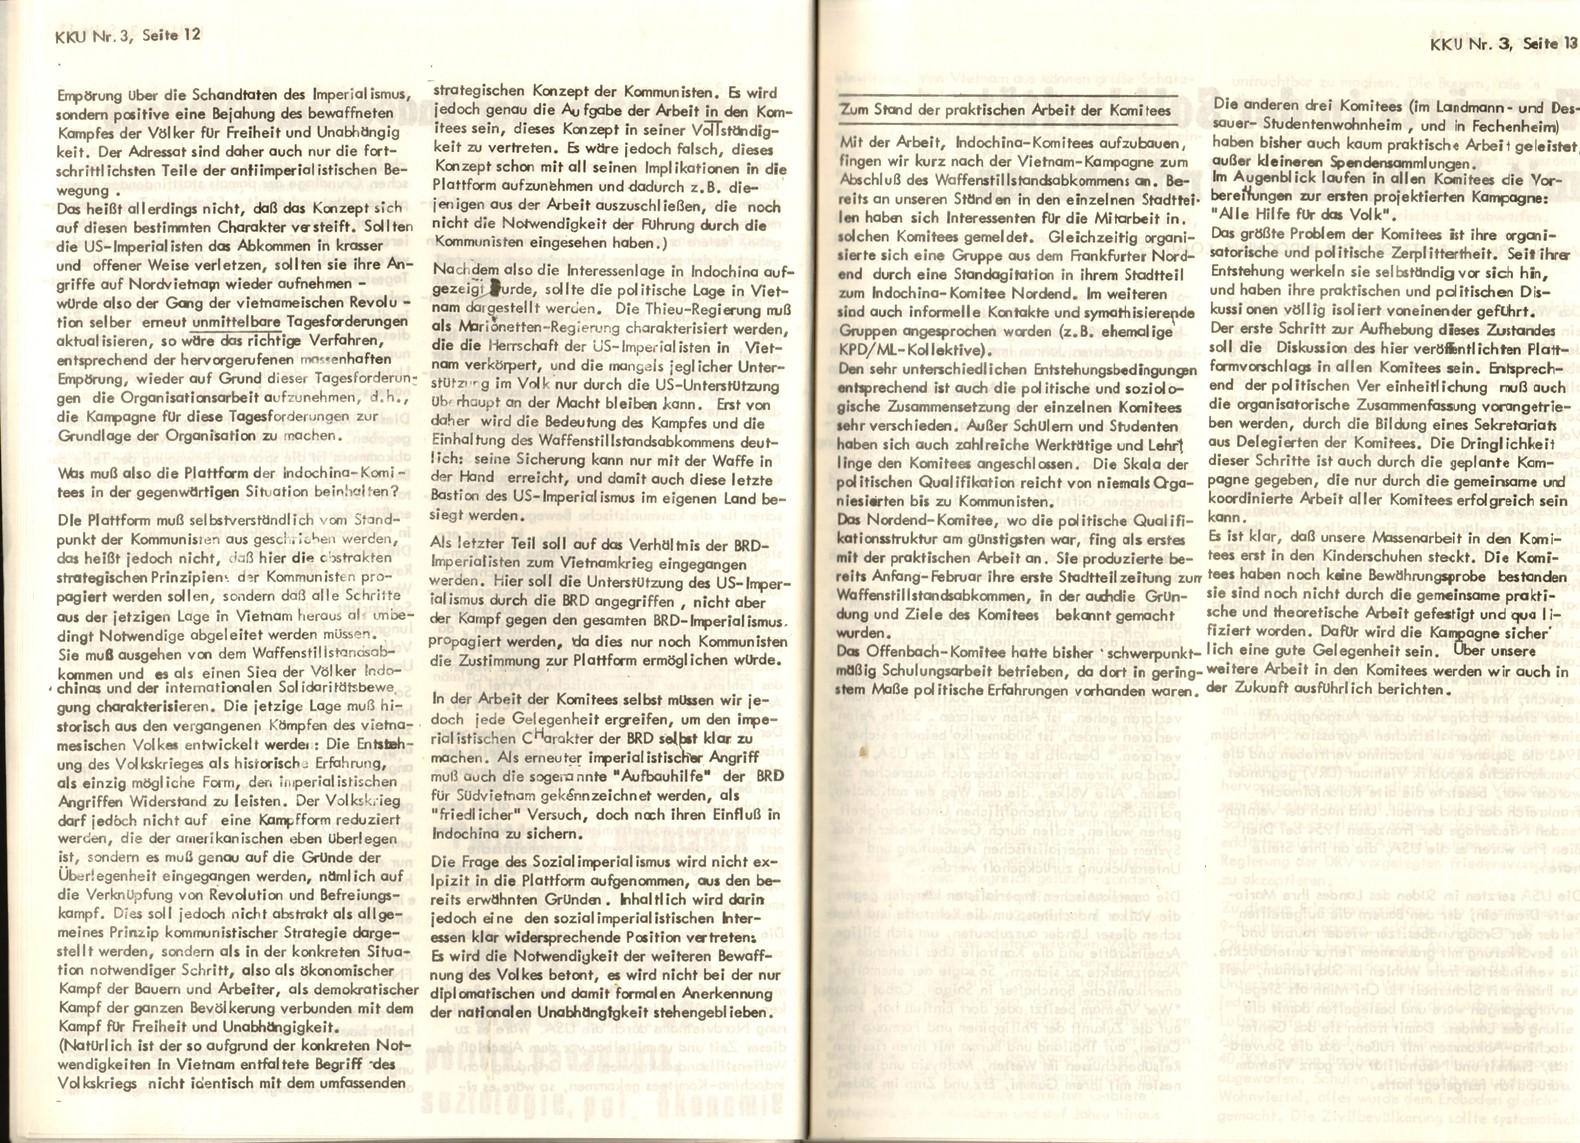 Frankfurt_Offenbach_KG_Kampf_Kritik_Umgestaltung_1973_03_08